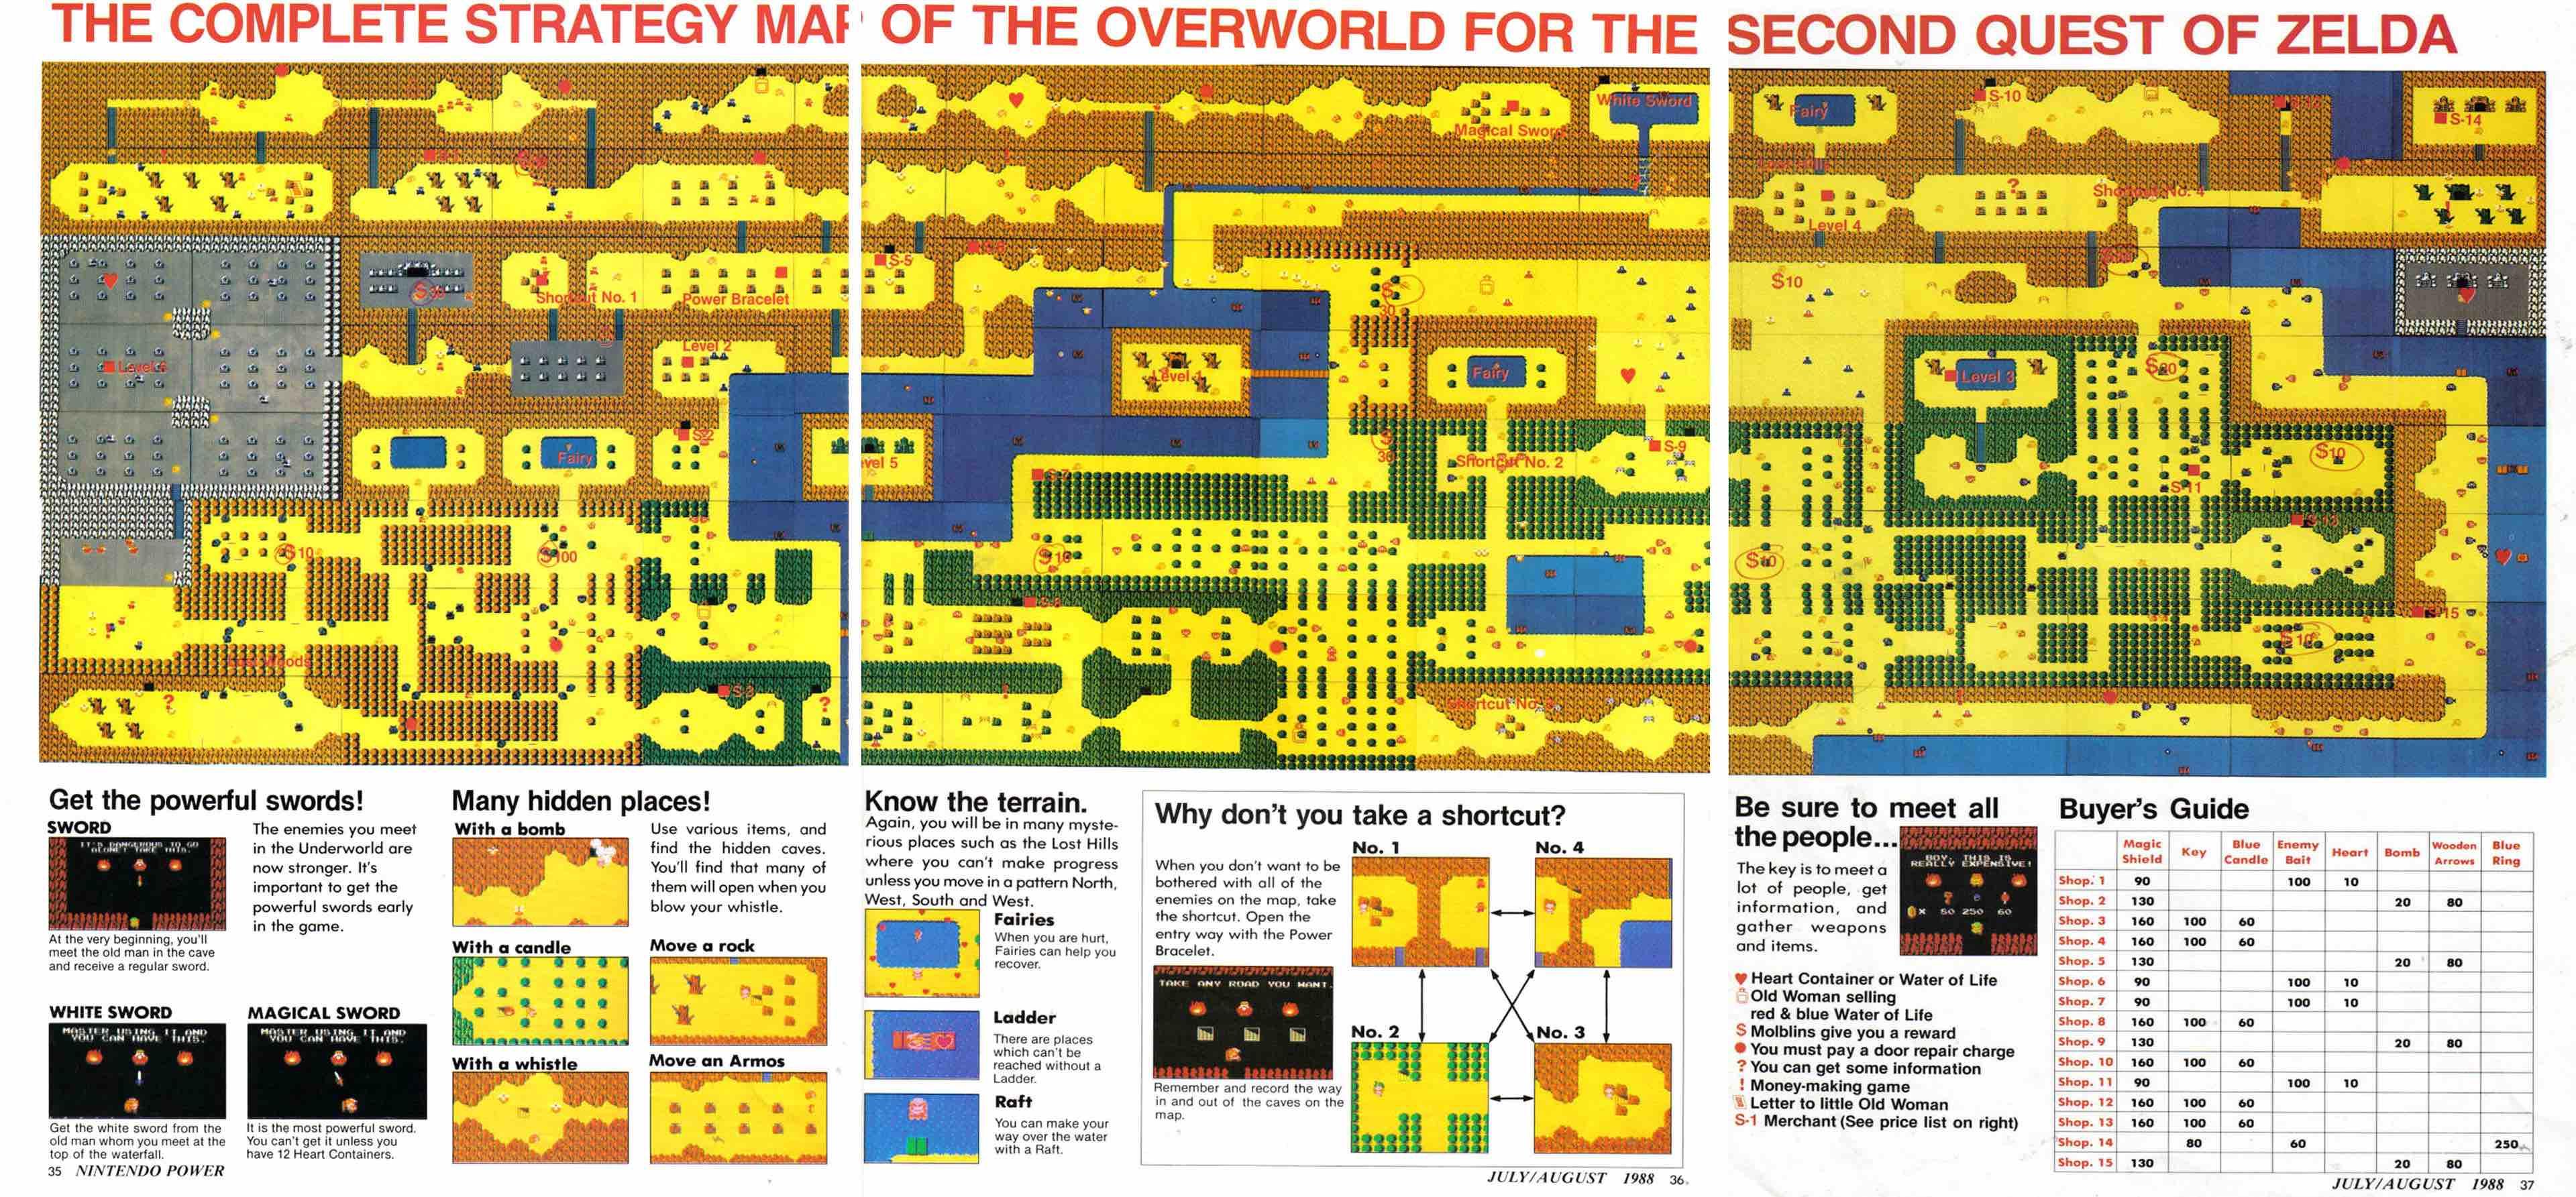 Nintendo Power   July August 1988 - pg 35-37